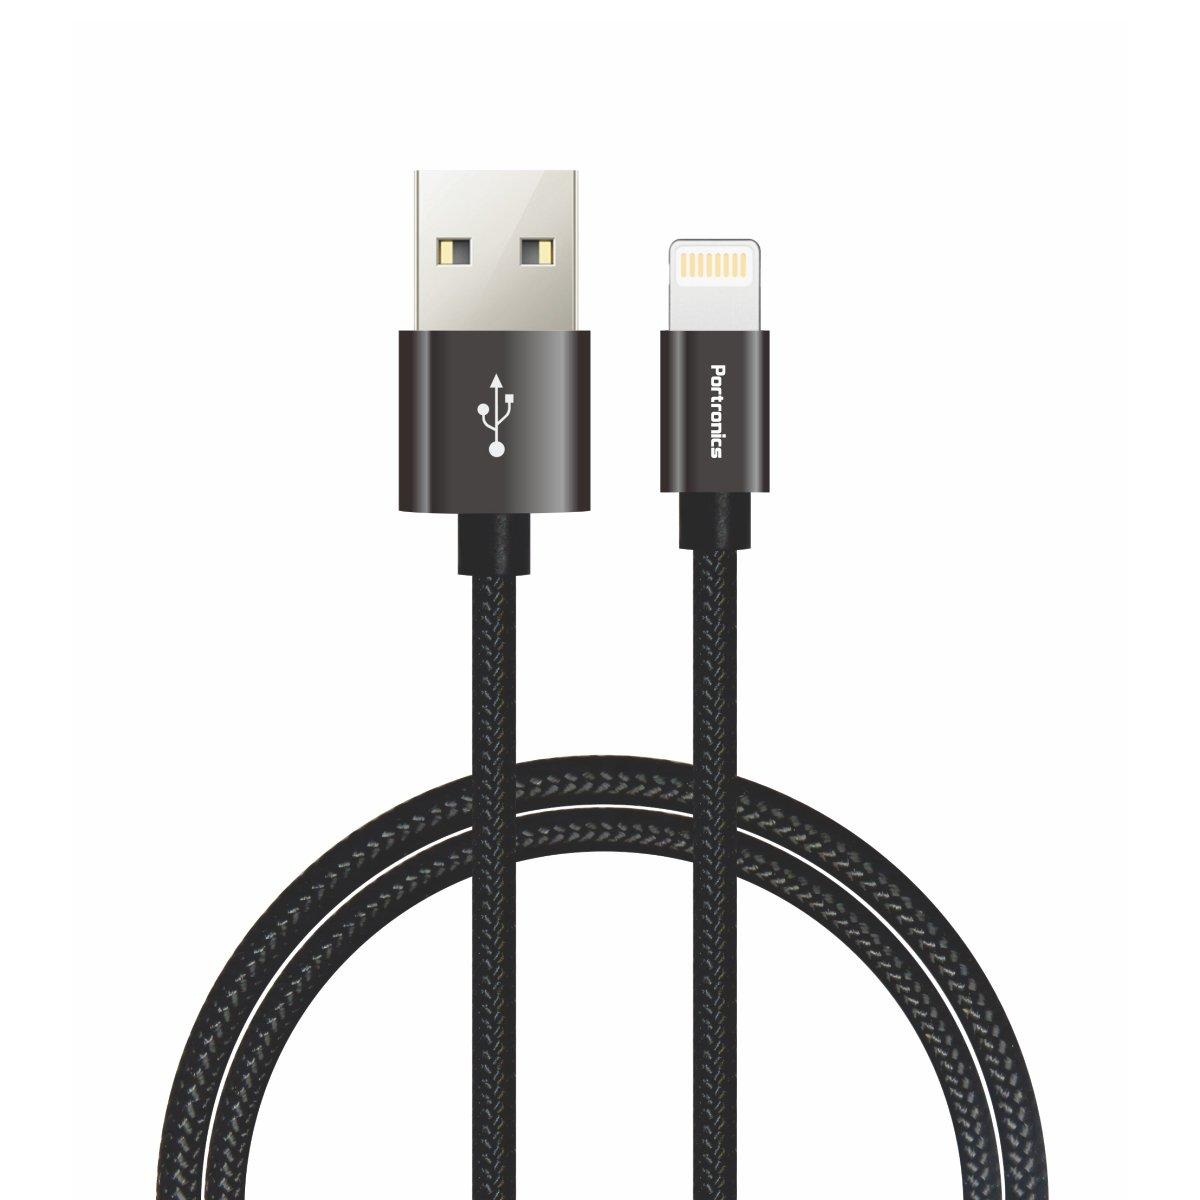 Portronics POR-792 Konnect Pro Data Cable - 3.9 Feet